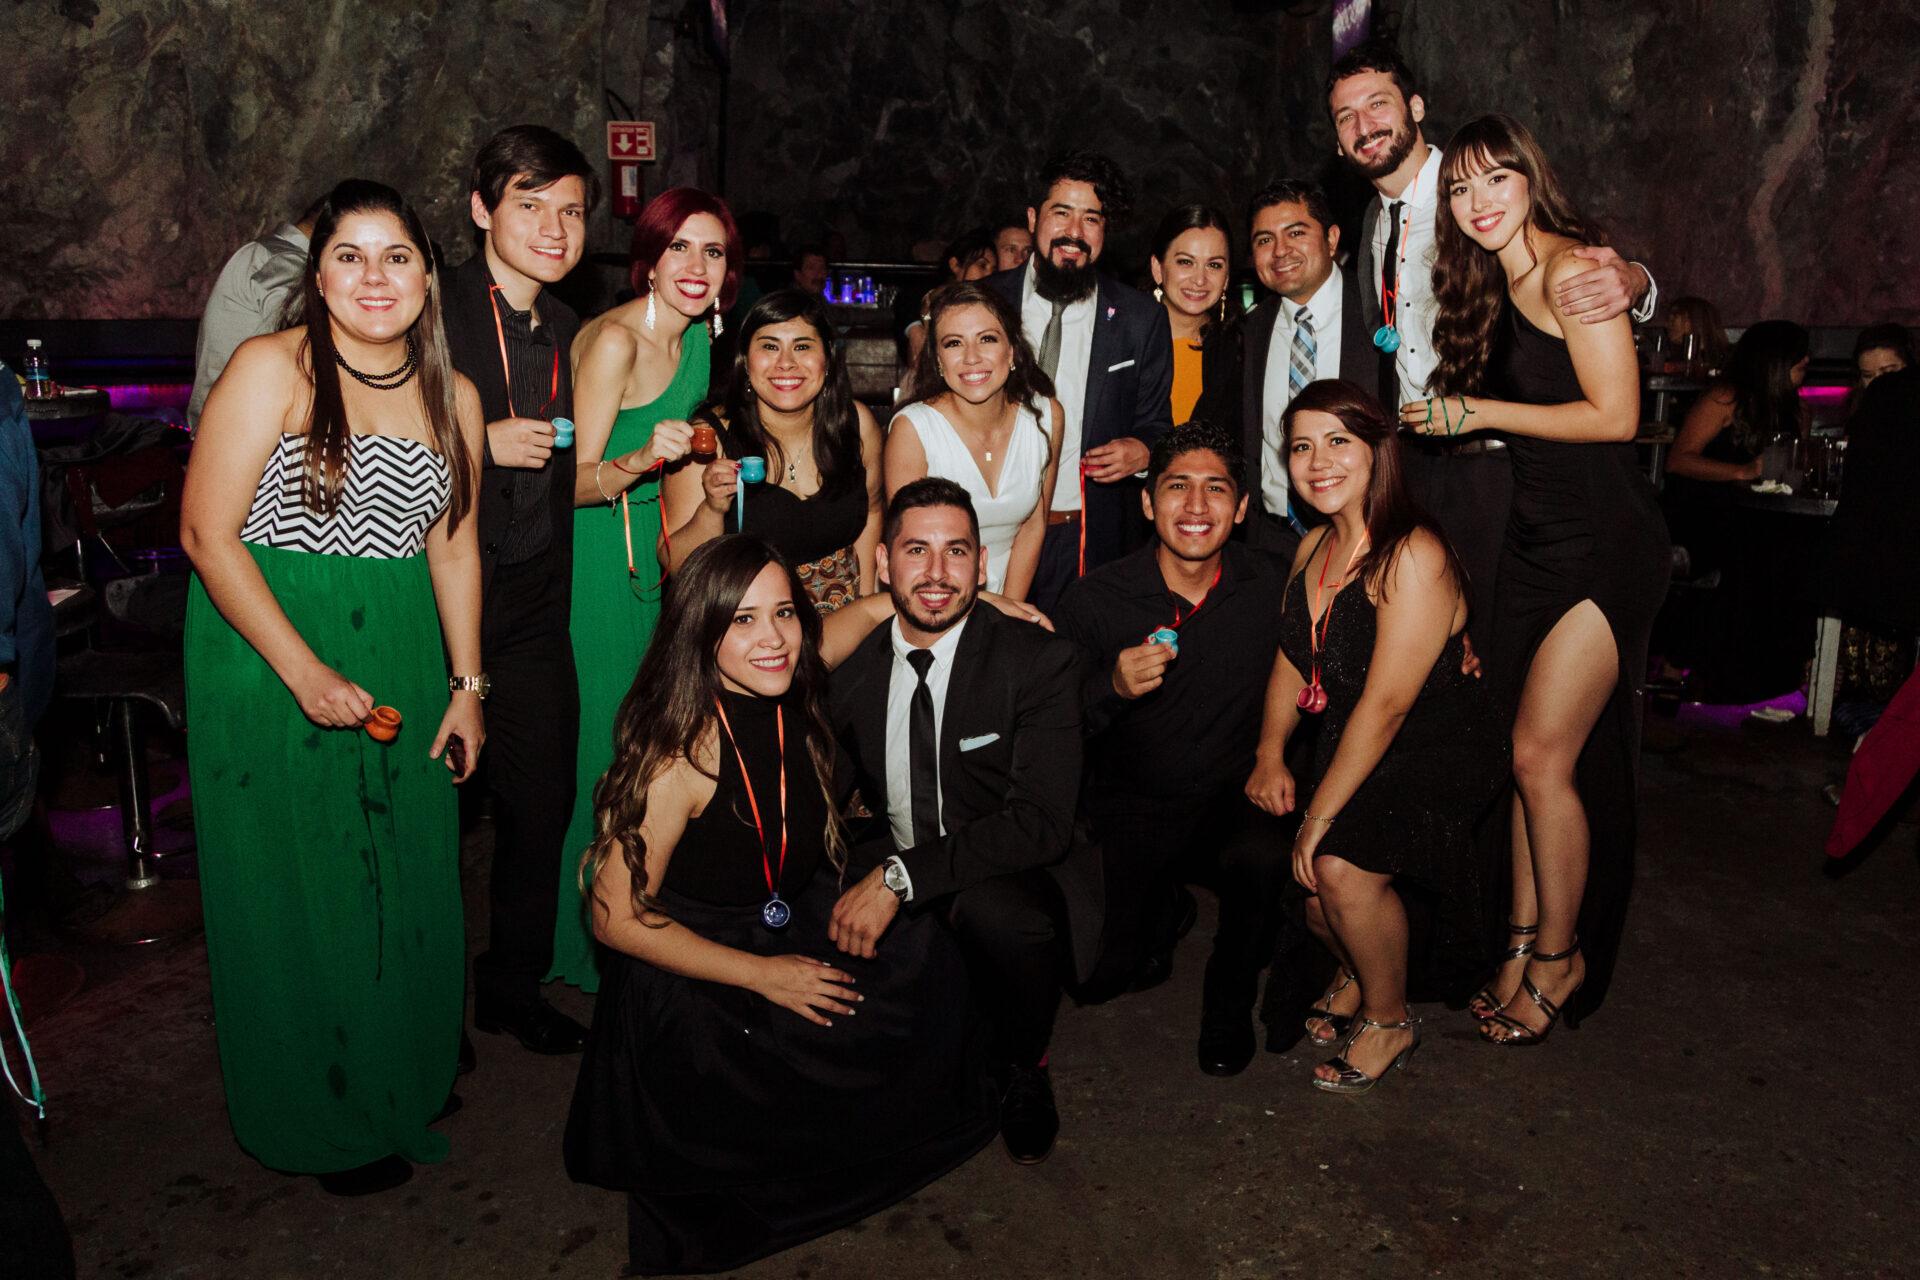 javier_noriega_fotografo_bodas_la_mina_club_zacatecas_wedding_photographer27